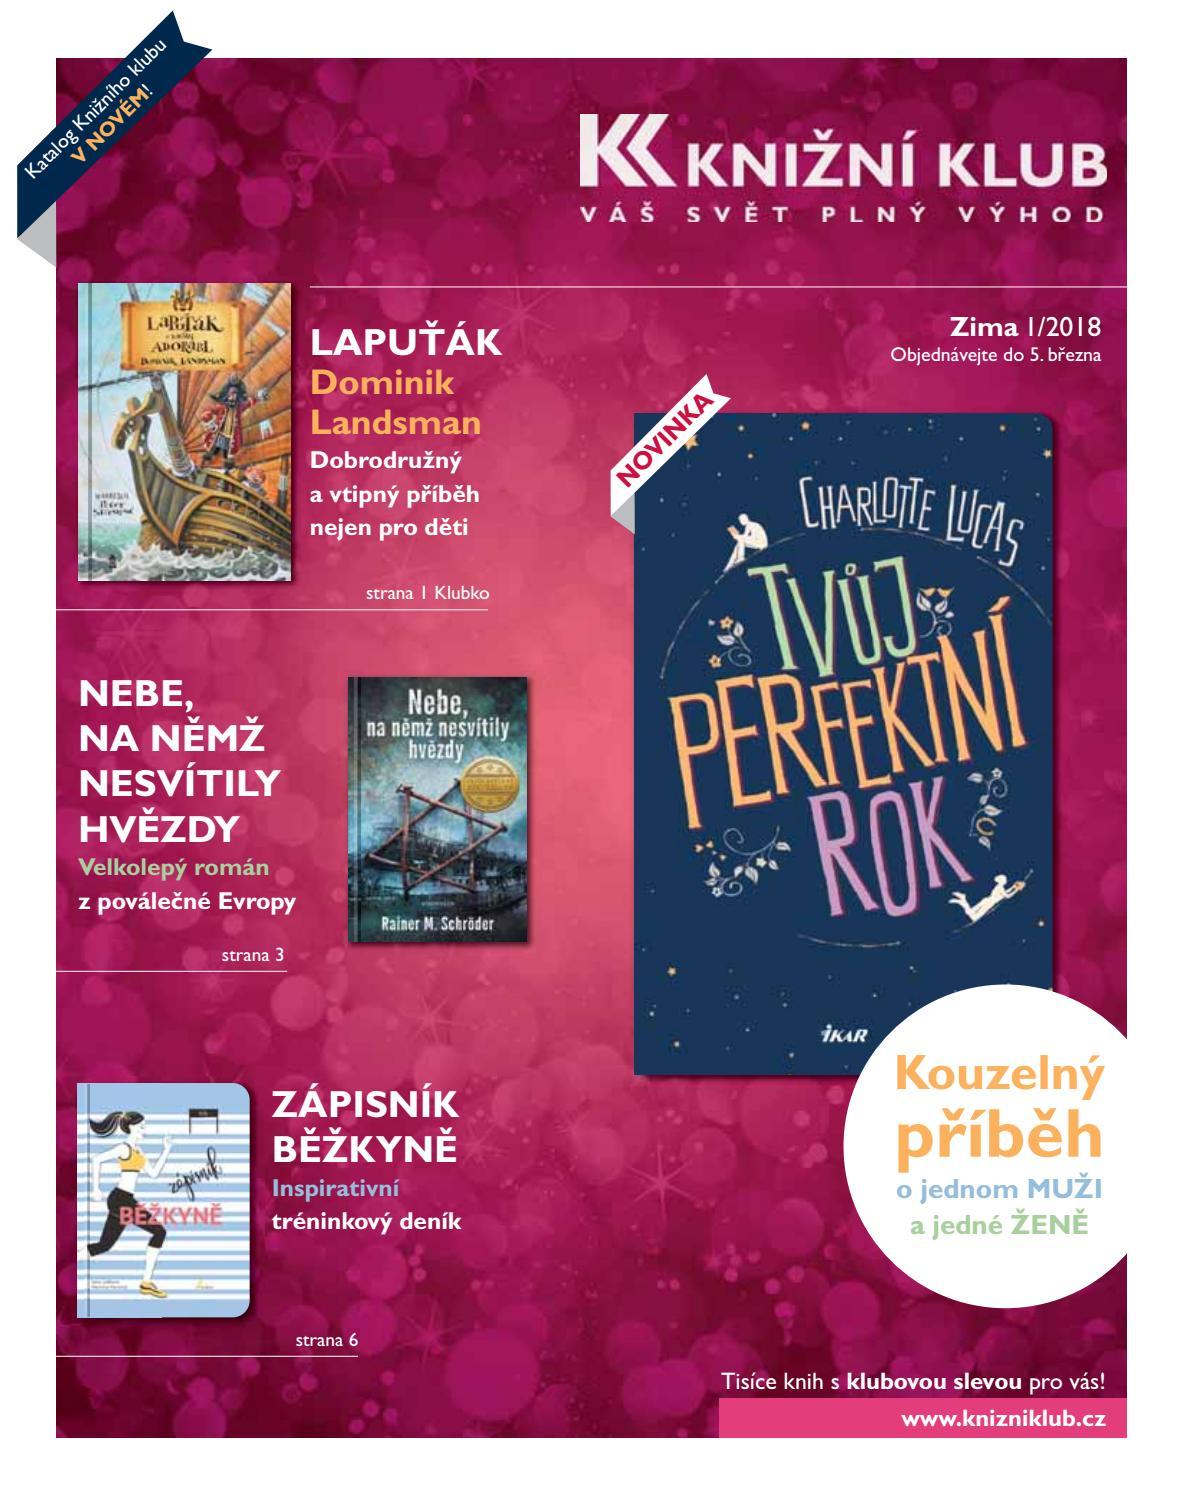 Katalog KK 1 2018 by Knižní klub - issuu 267e59605c